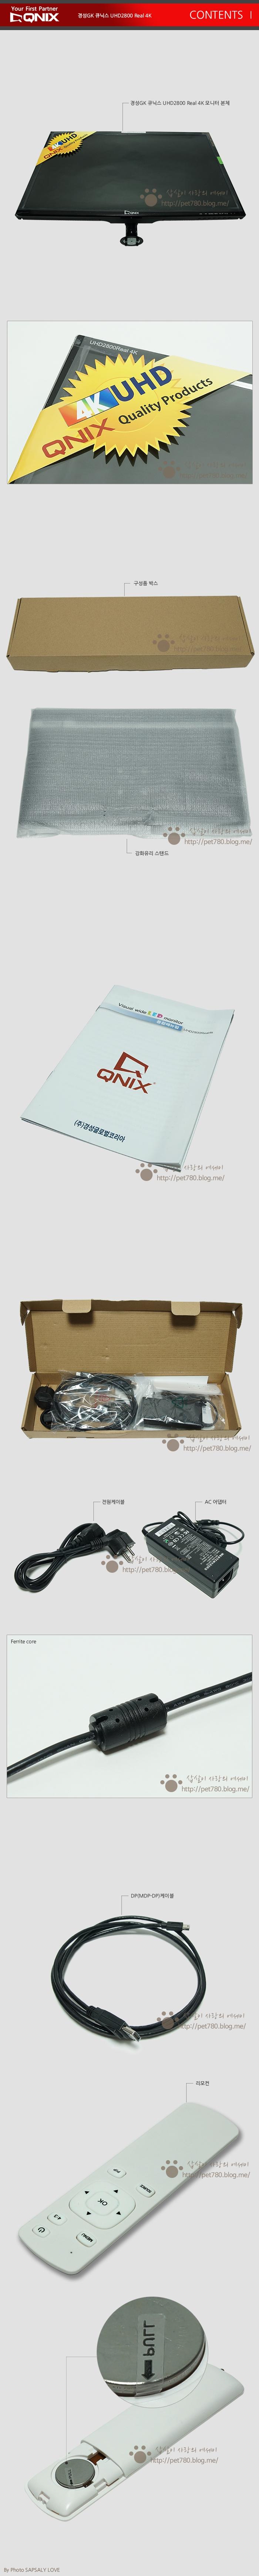 UHD 모니터 구성품 경성GK 큐닉스 UHD2800 Real 4K.jpg